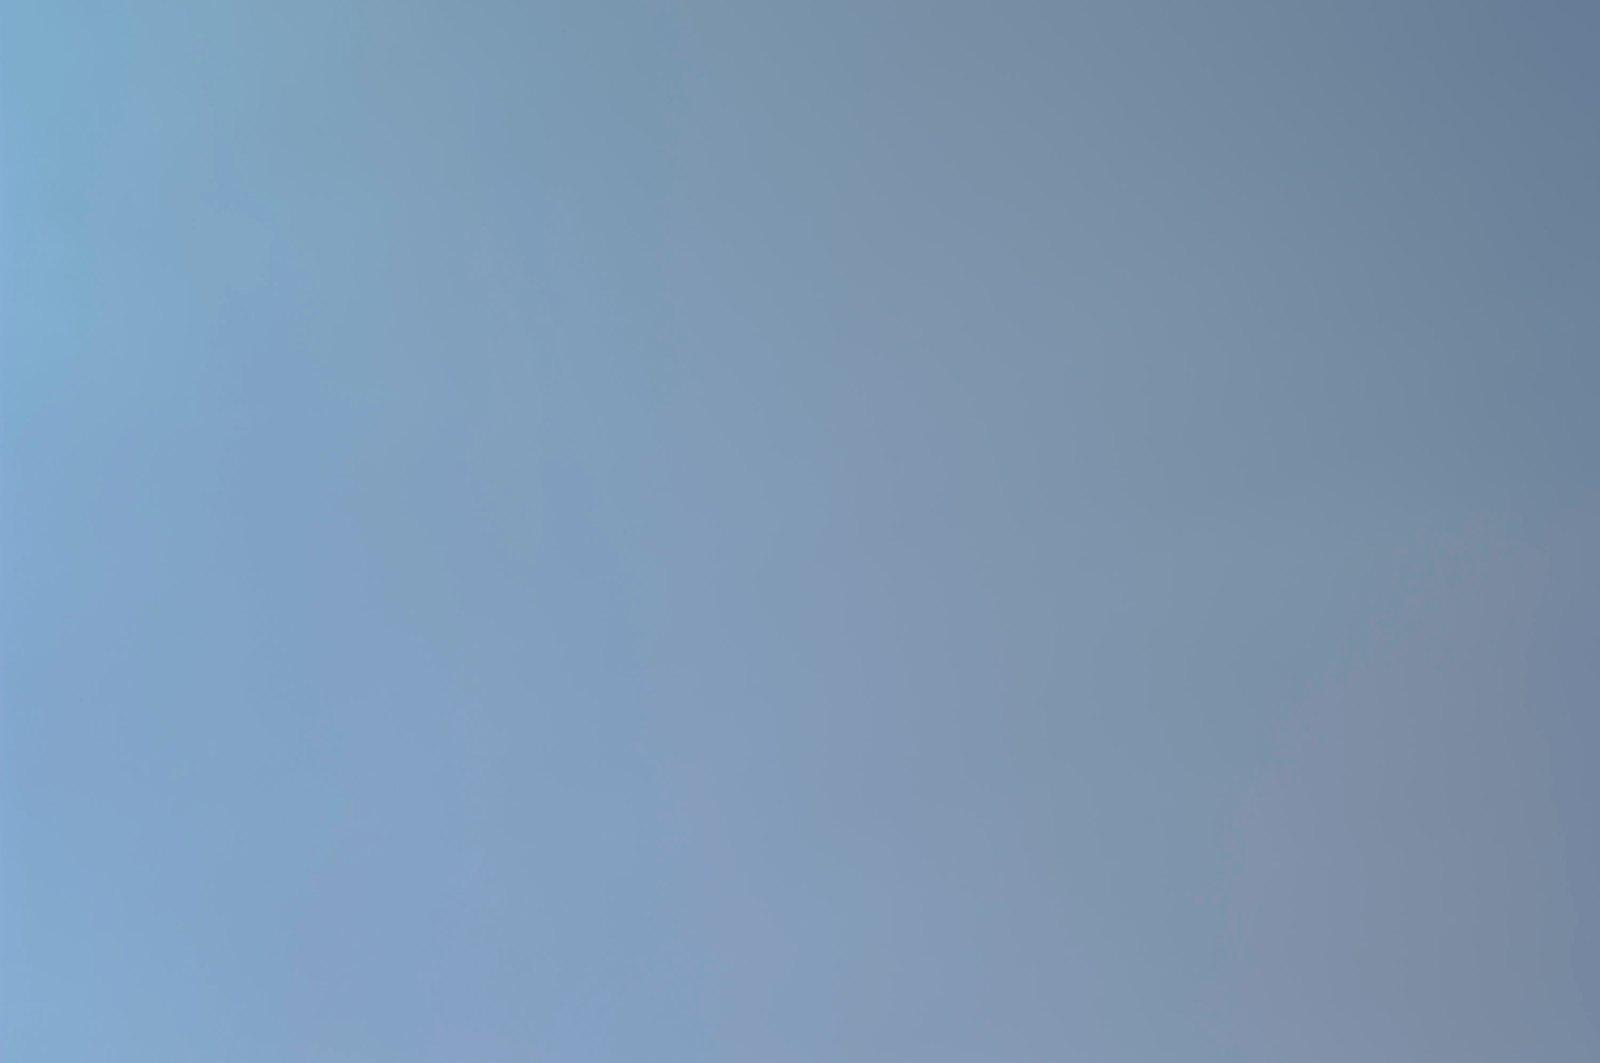 Blue Sky, 2013, Gicleé print, 50 x 75,6 cm, Ed. 5